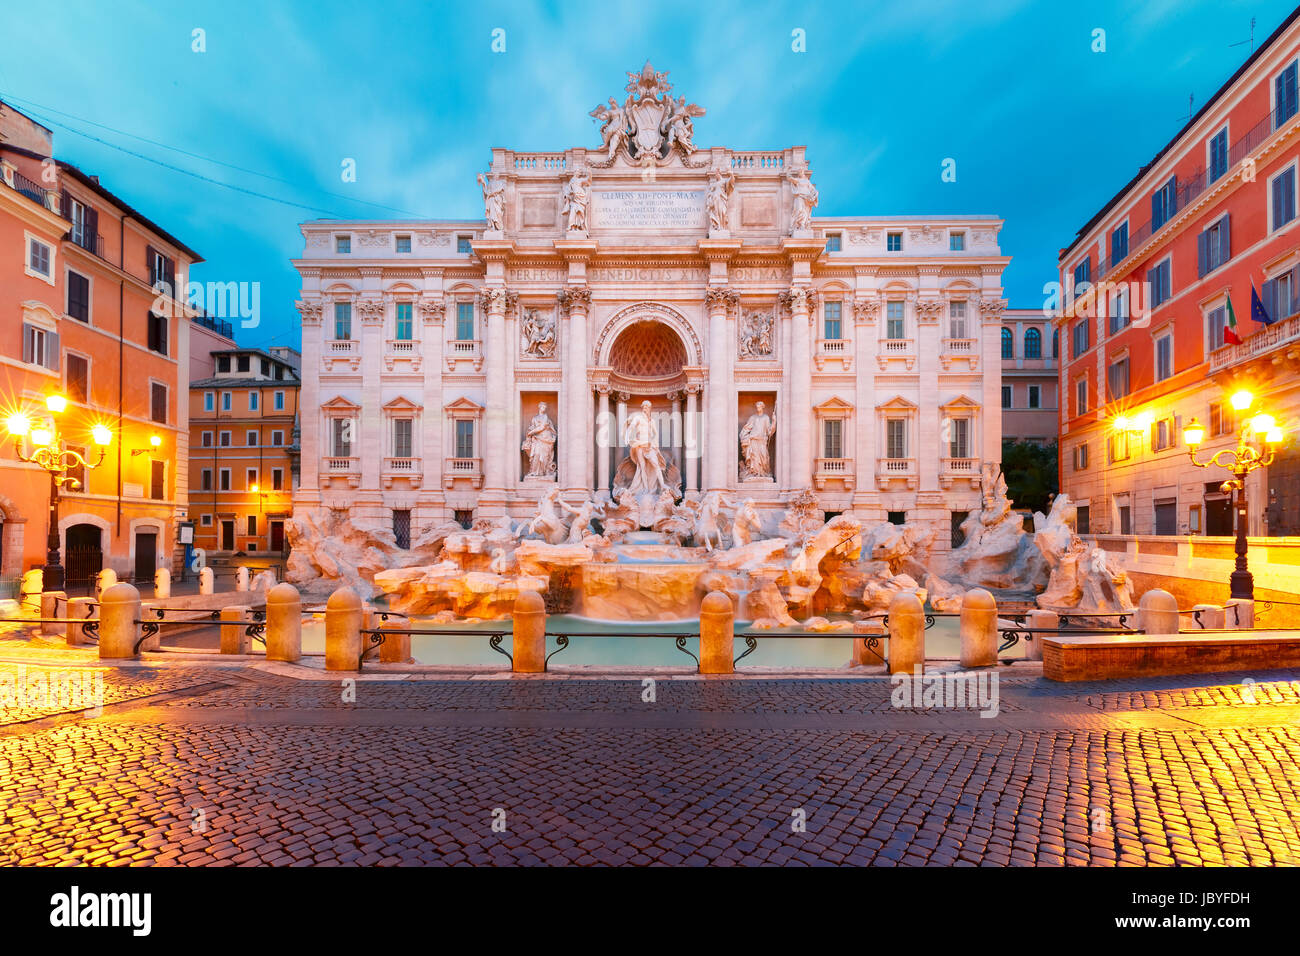 Trevi Fountain or Fontana di Trevi in Rome, Italy Stock Photo